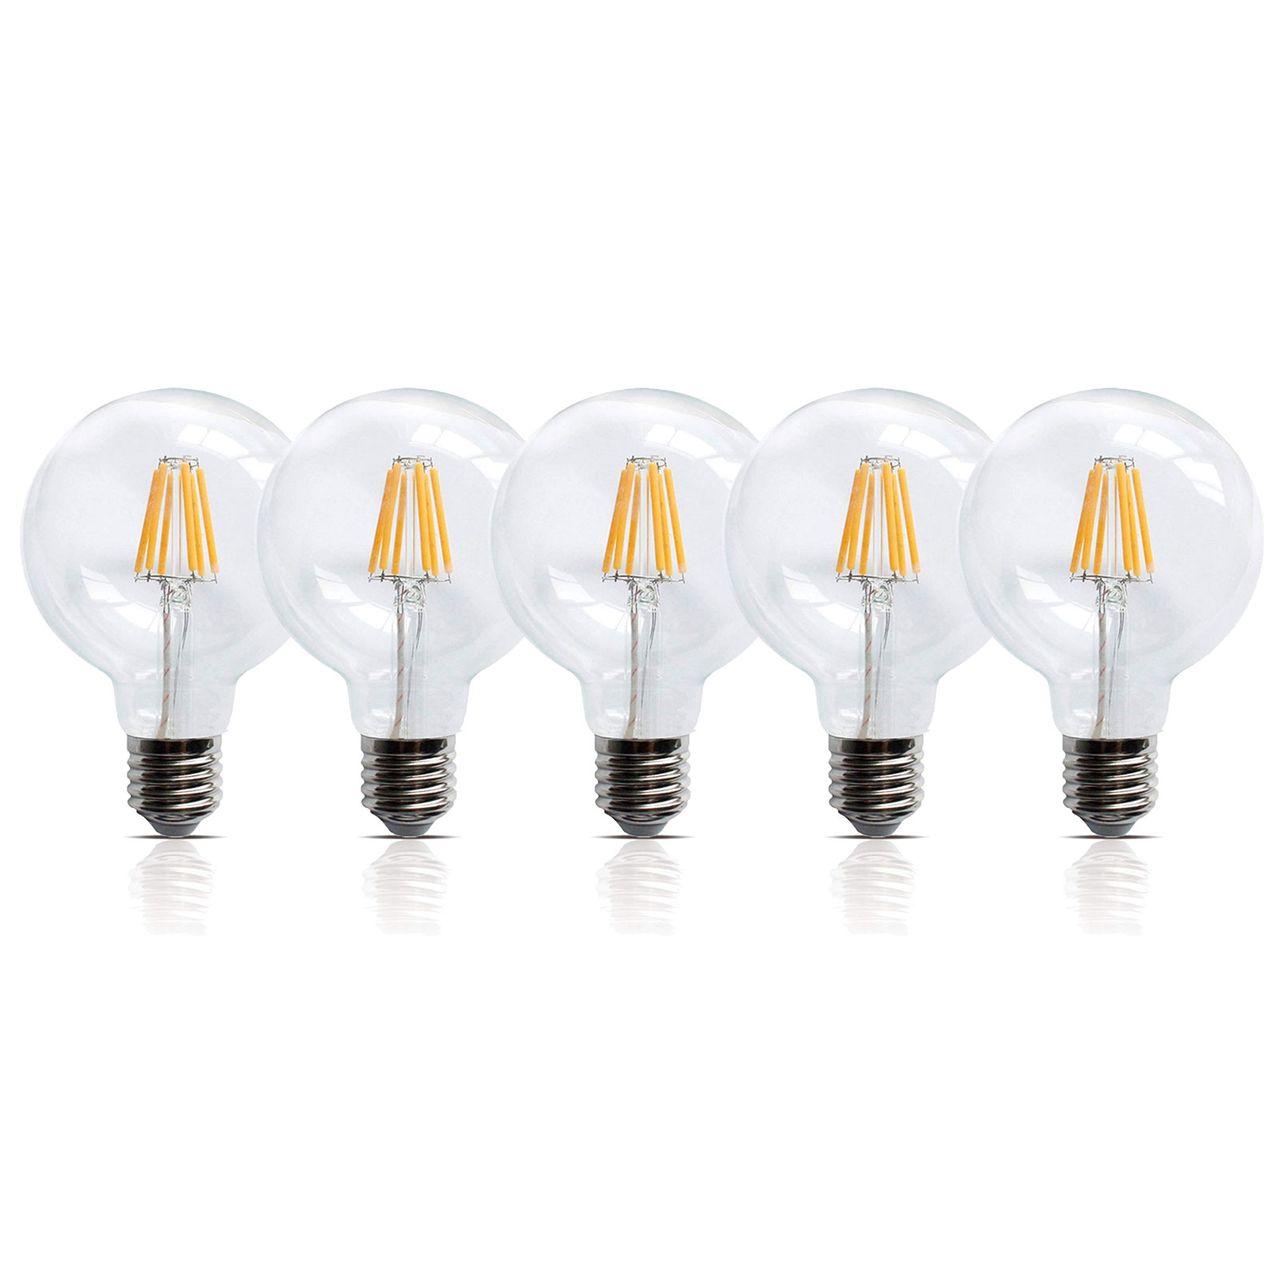 5 Stück LED Filament Leuchte E27 6W 600 Lumen A+ Lampe Glühfaden Innenbereich